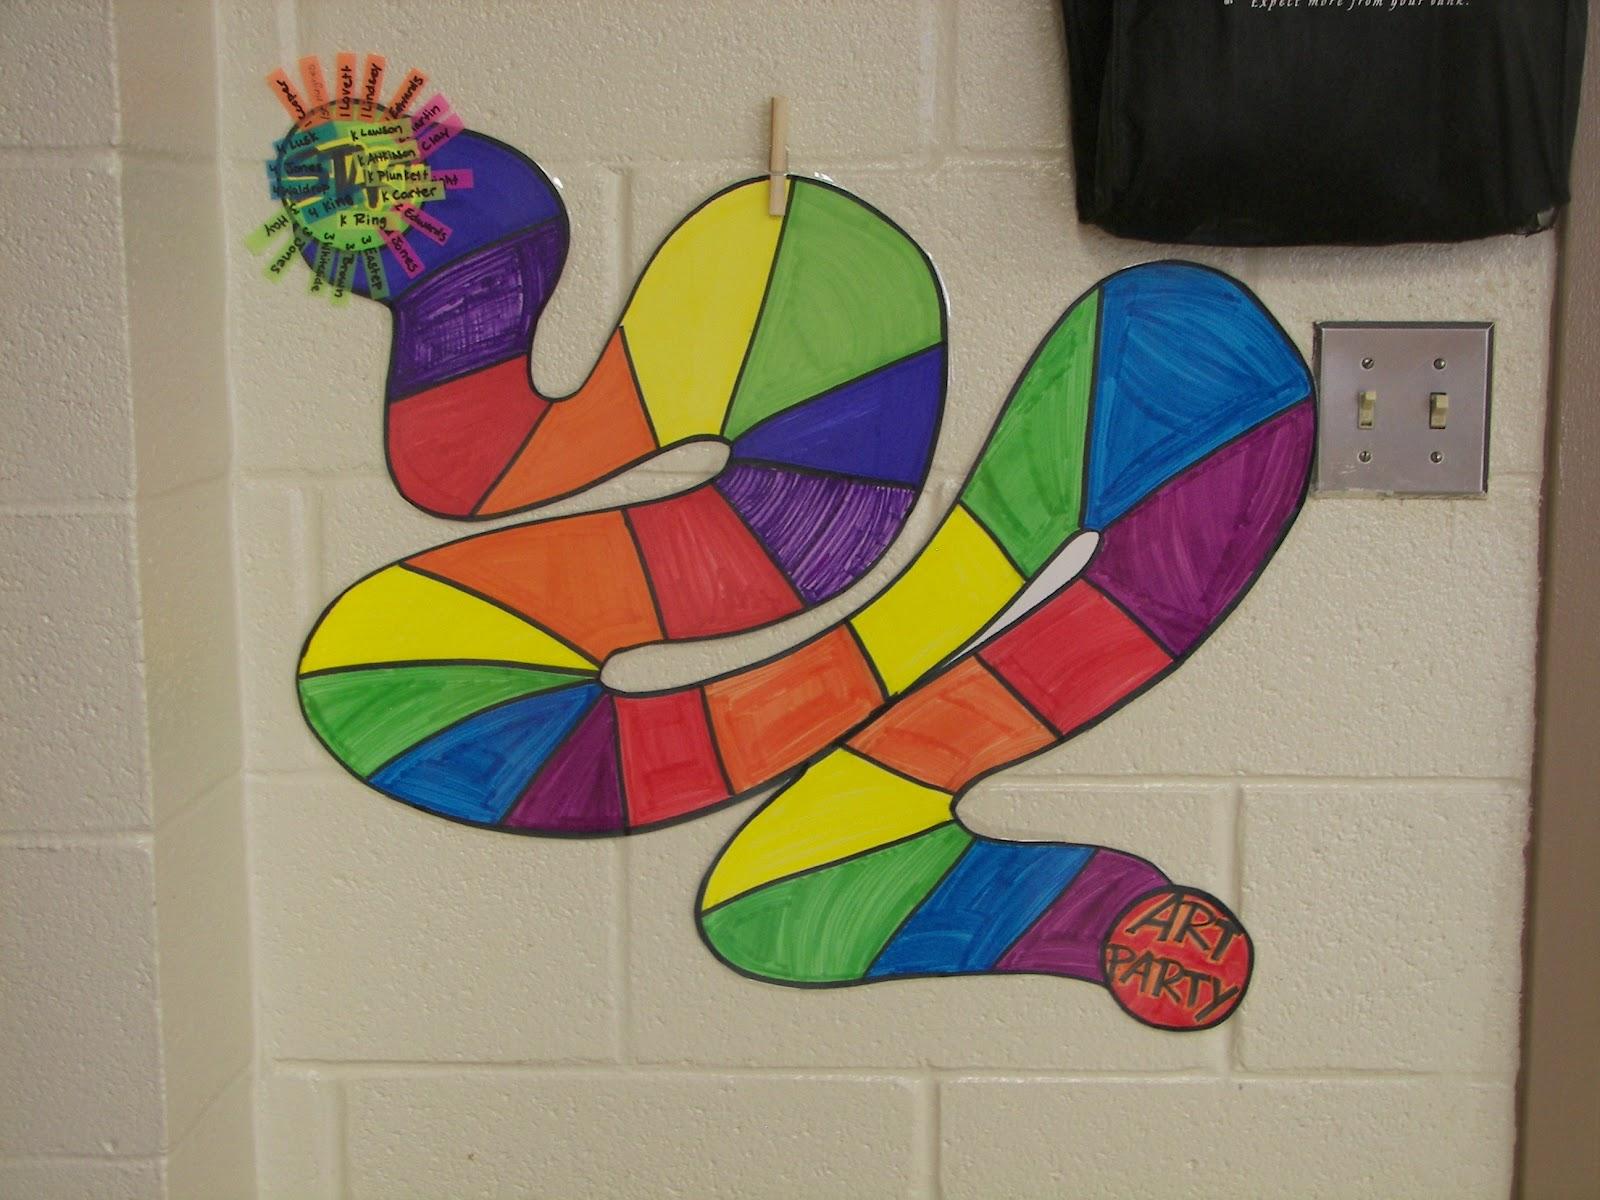 Classroom Party Ideas For Good Behavior : That little art teacher good behavior party reward